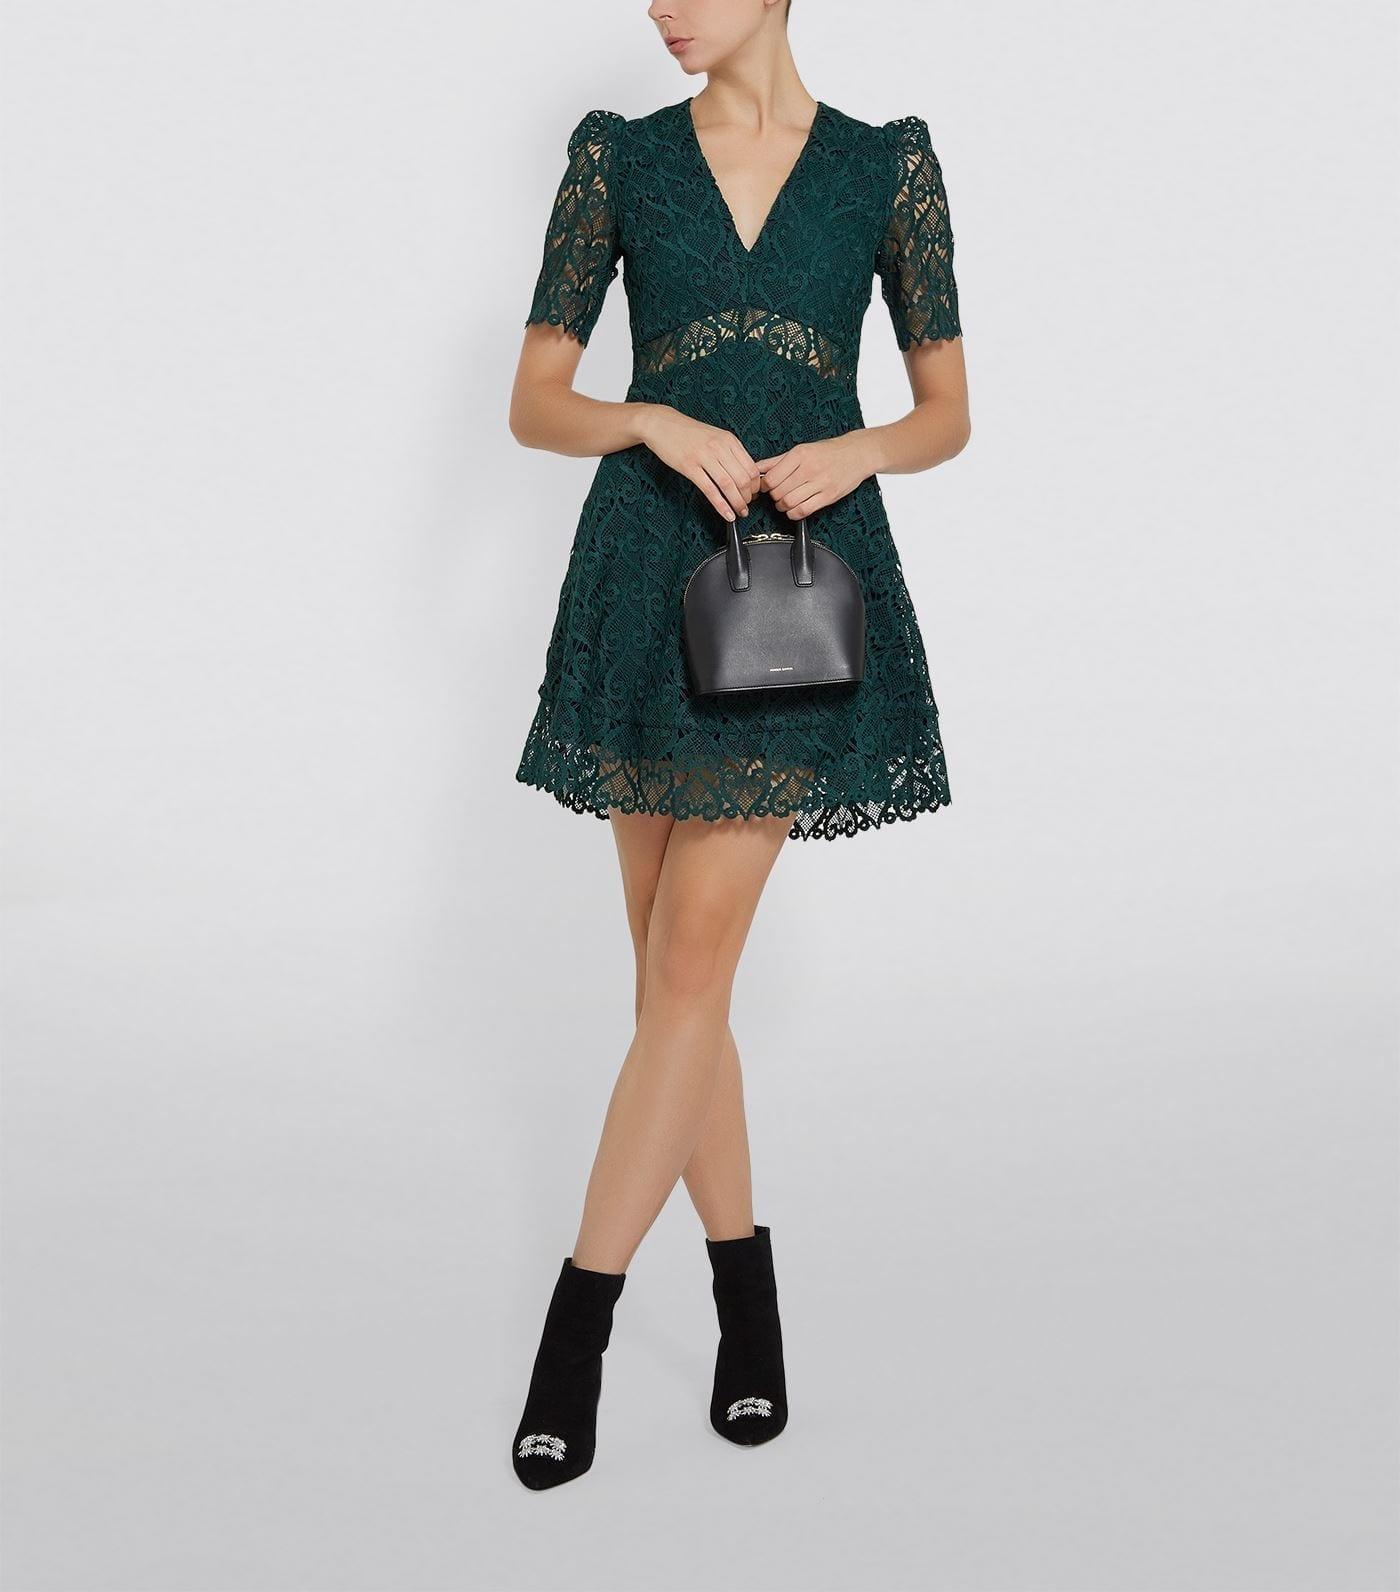 SANDRO Lace A-Line Dress